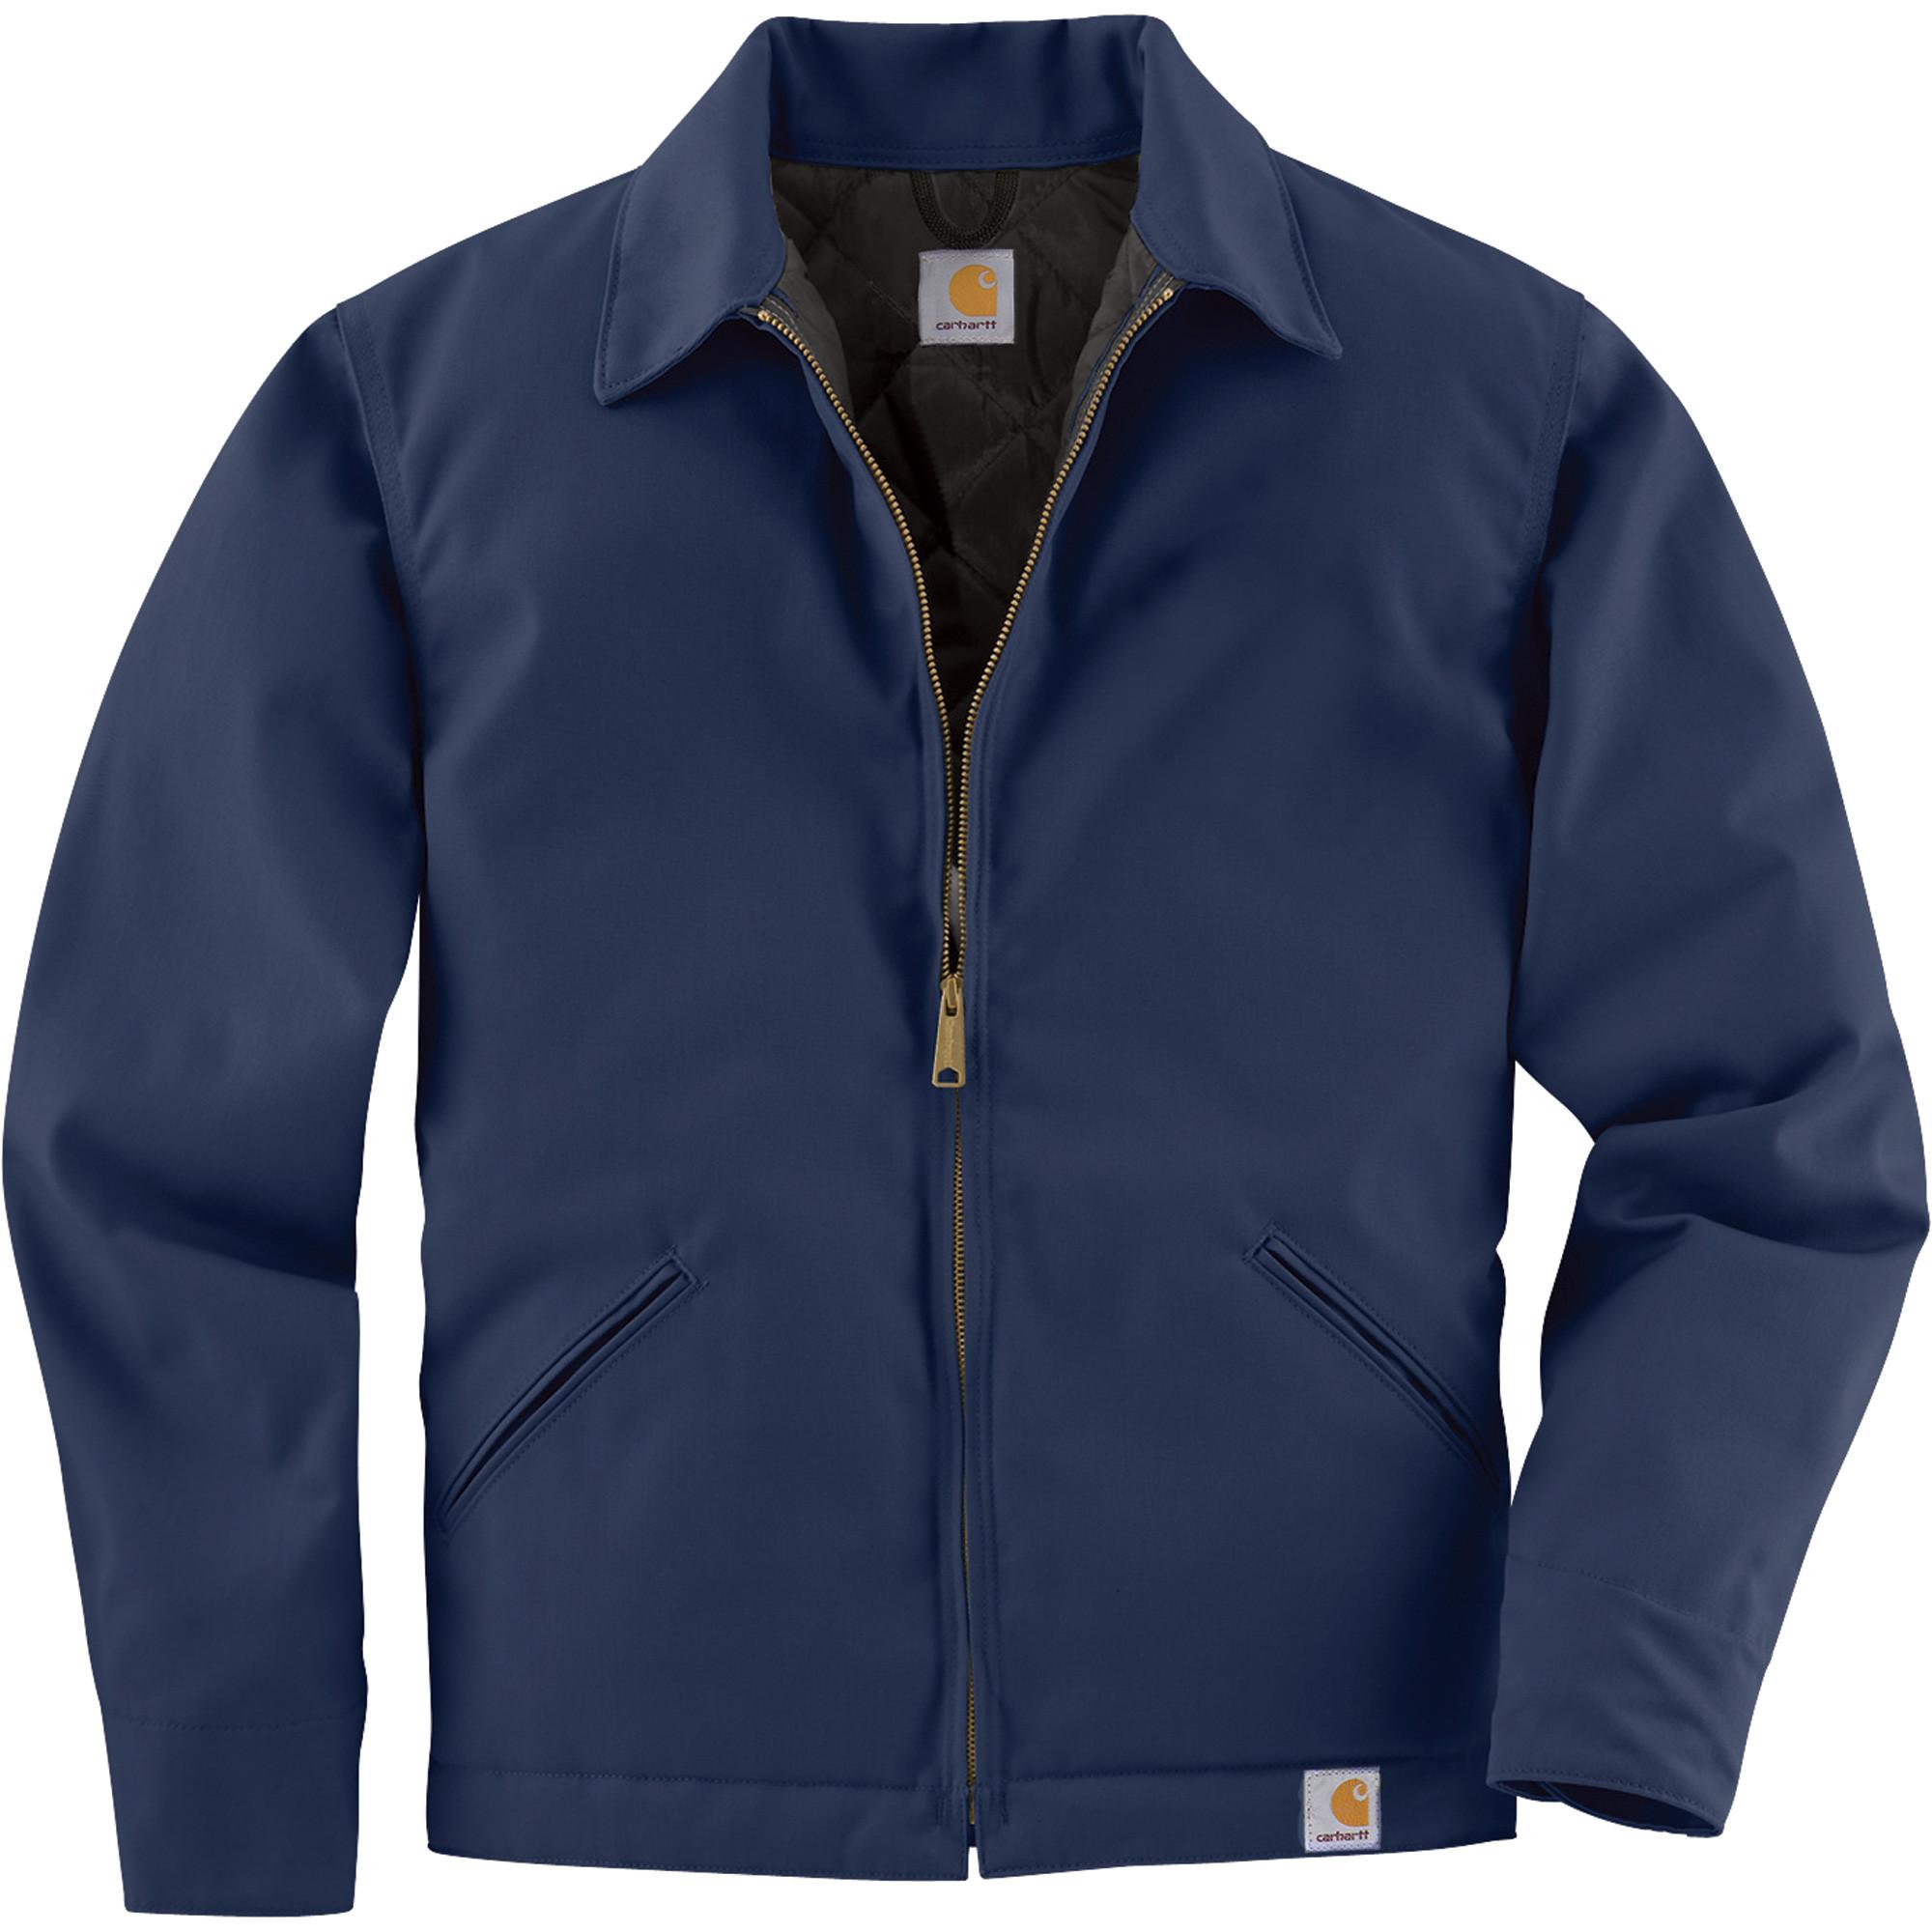 Куртка Carhartt Twill Work Jacket - J293 (Navy, XL)